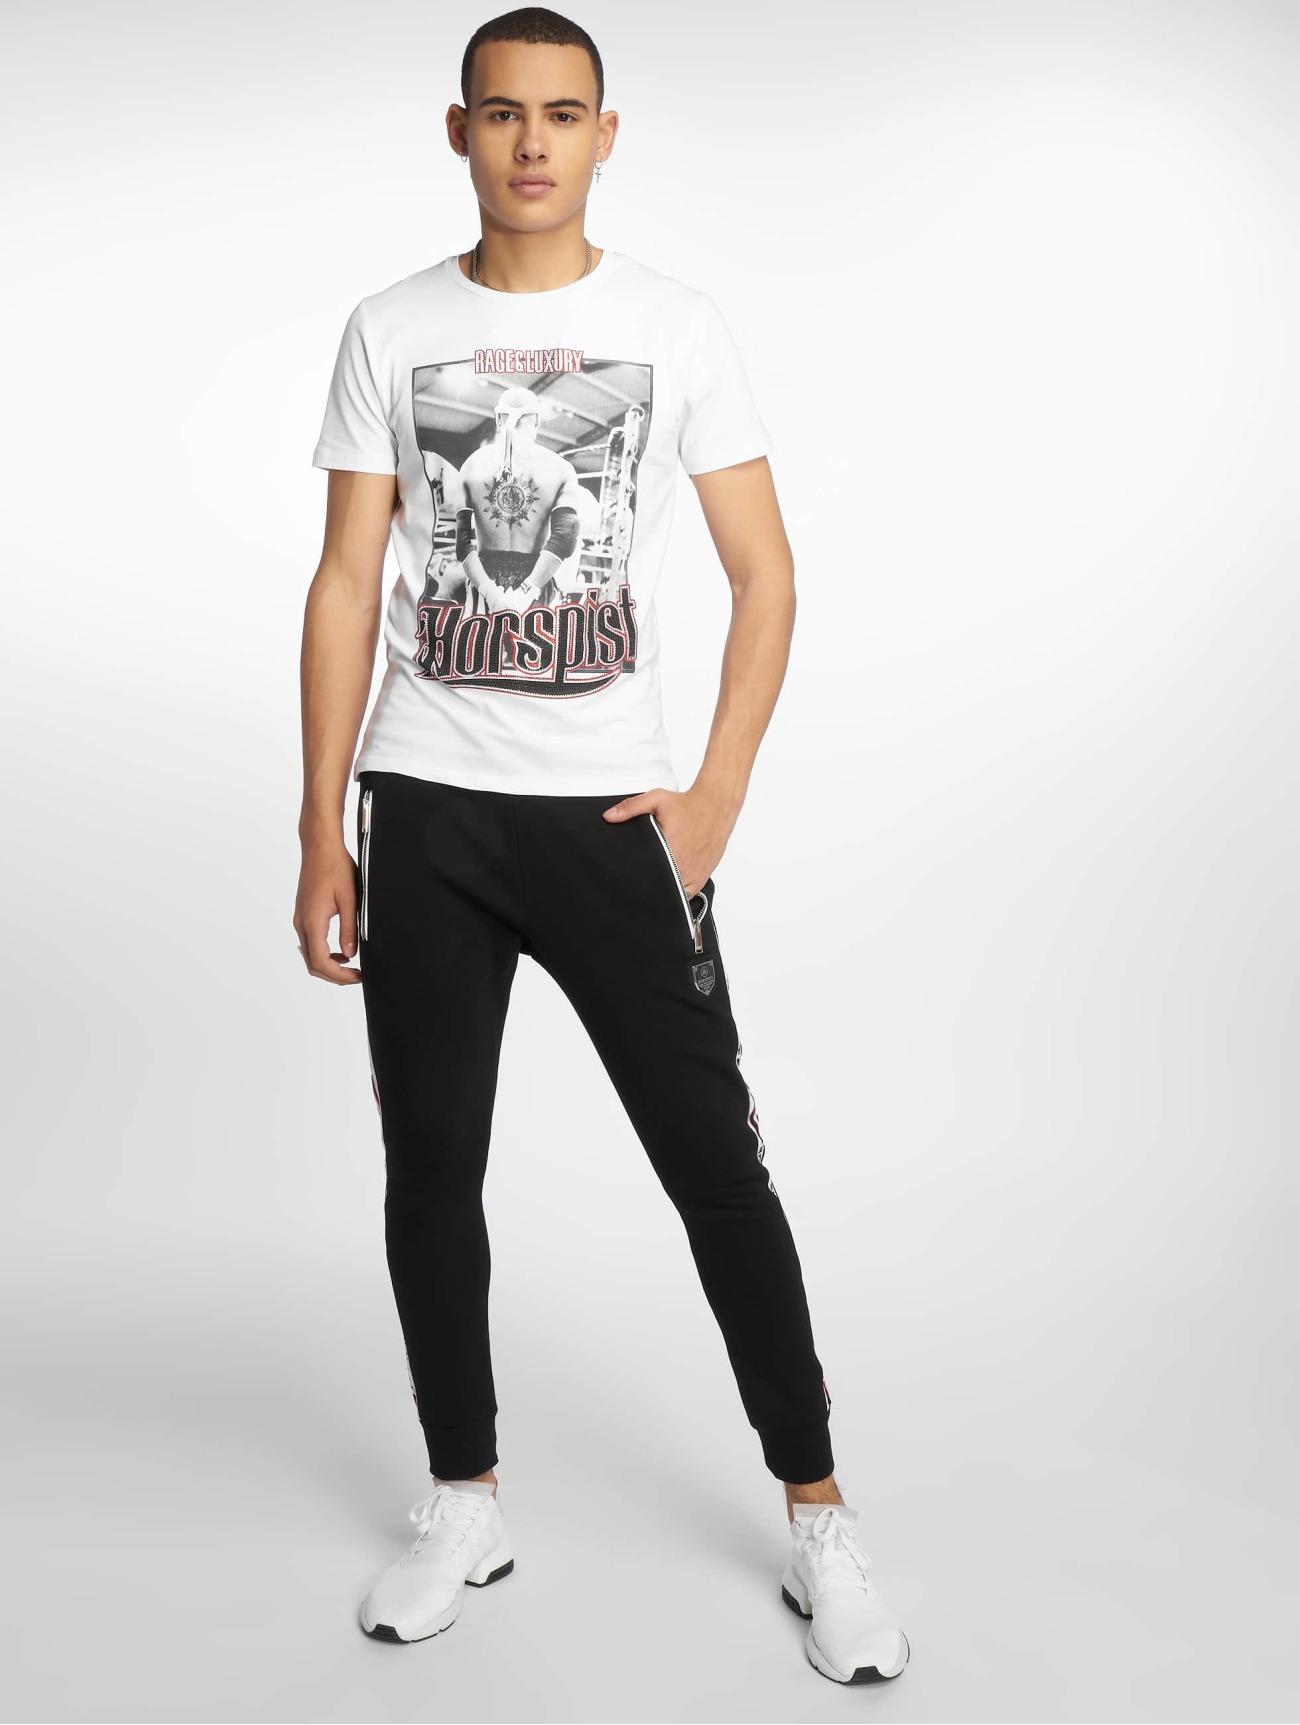 Horspist   Jordan  blanc Homme T-Shirt  616612  Homme Hauts